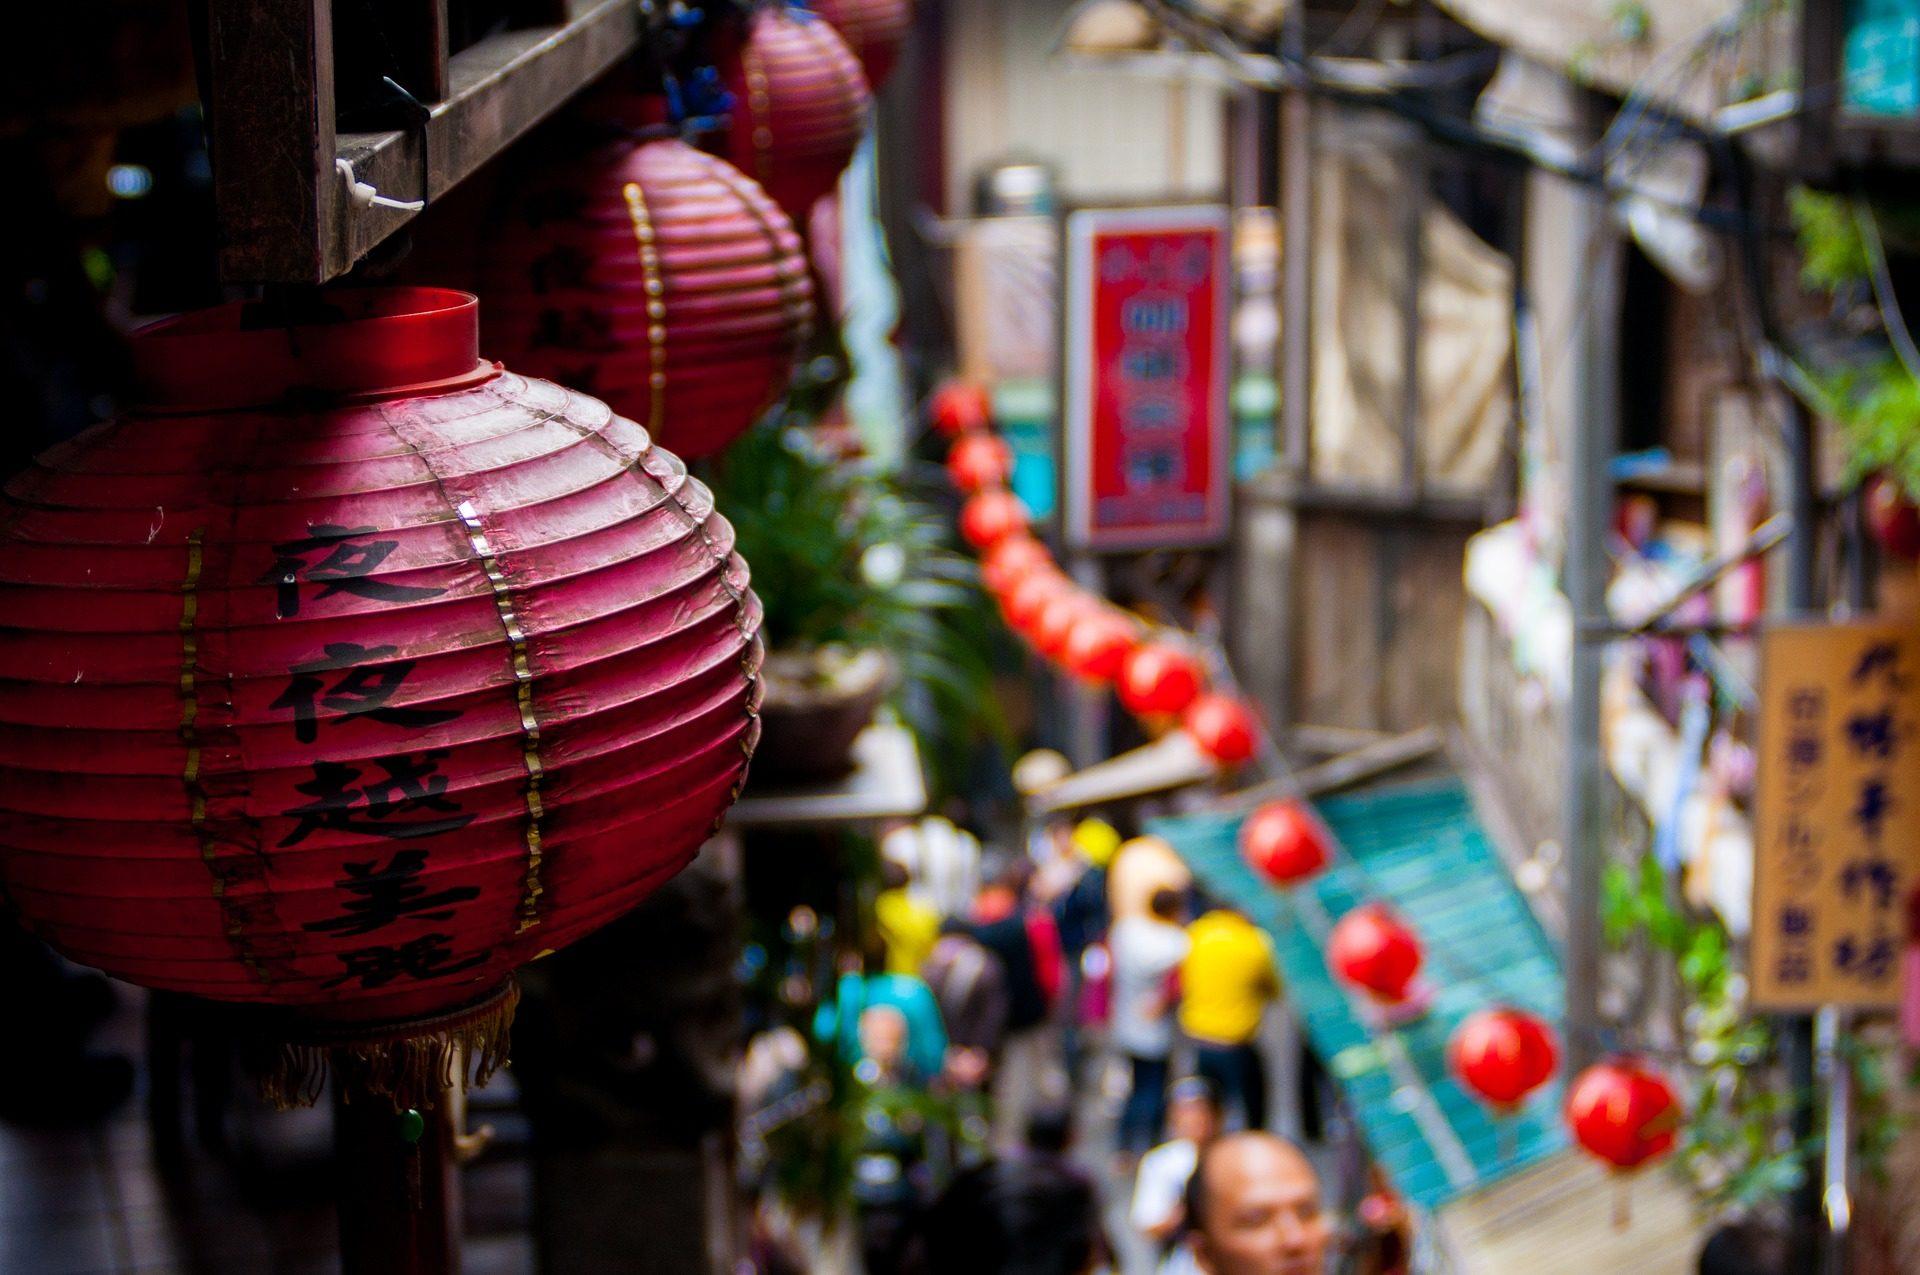 barrio, gente, celebración, asiático, ornamentación - Fondos de Pantalla HD - professor-falken.com